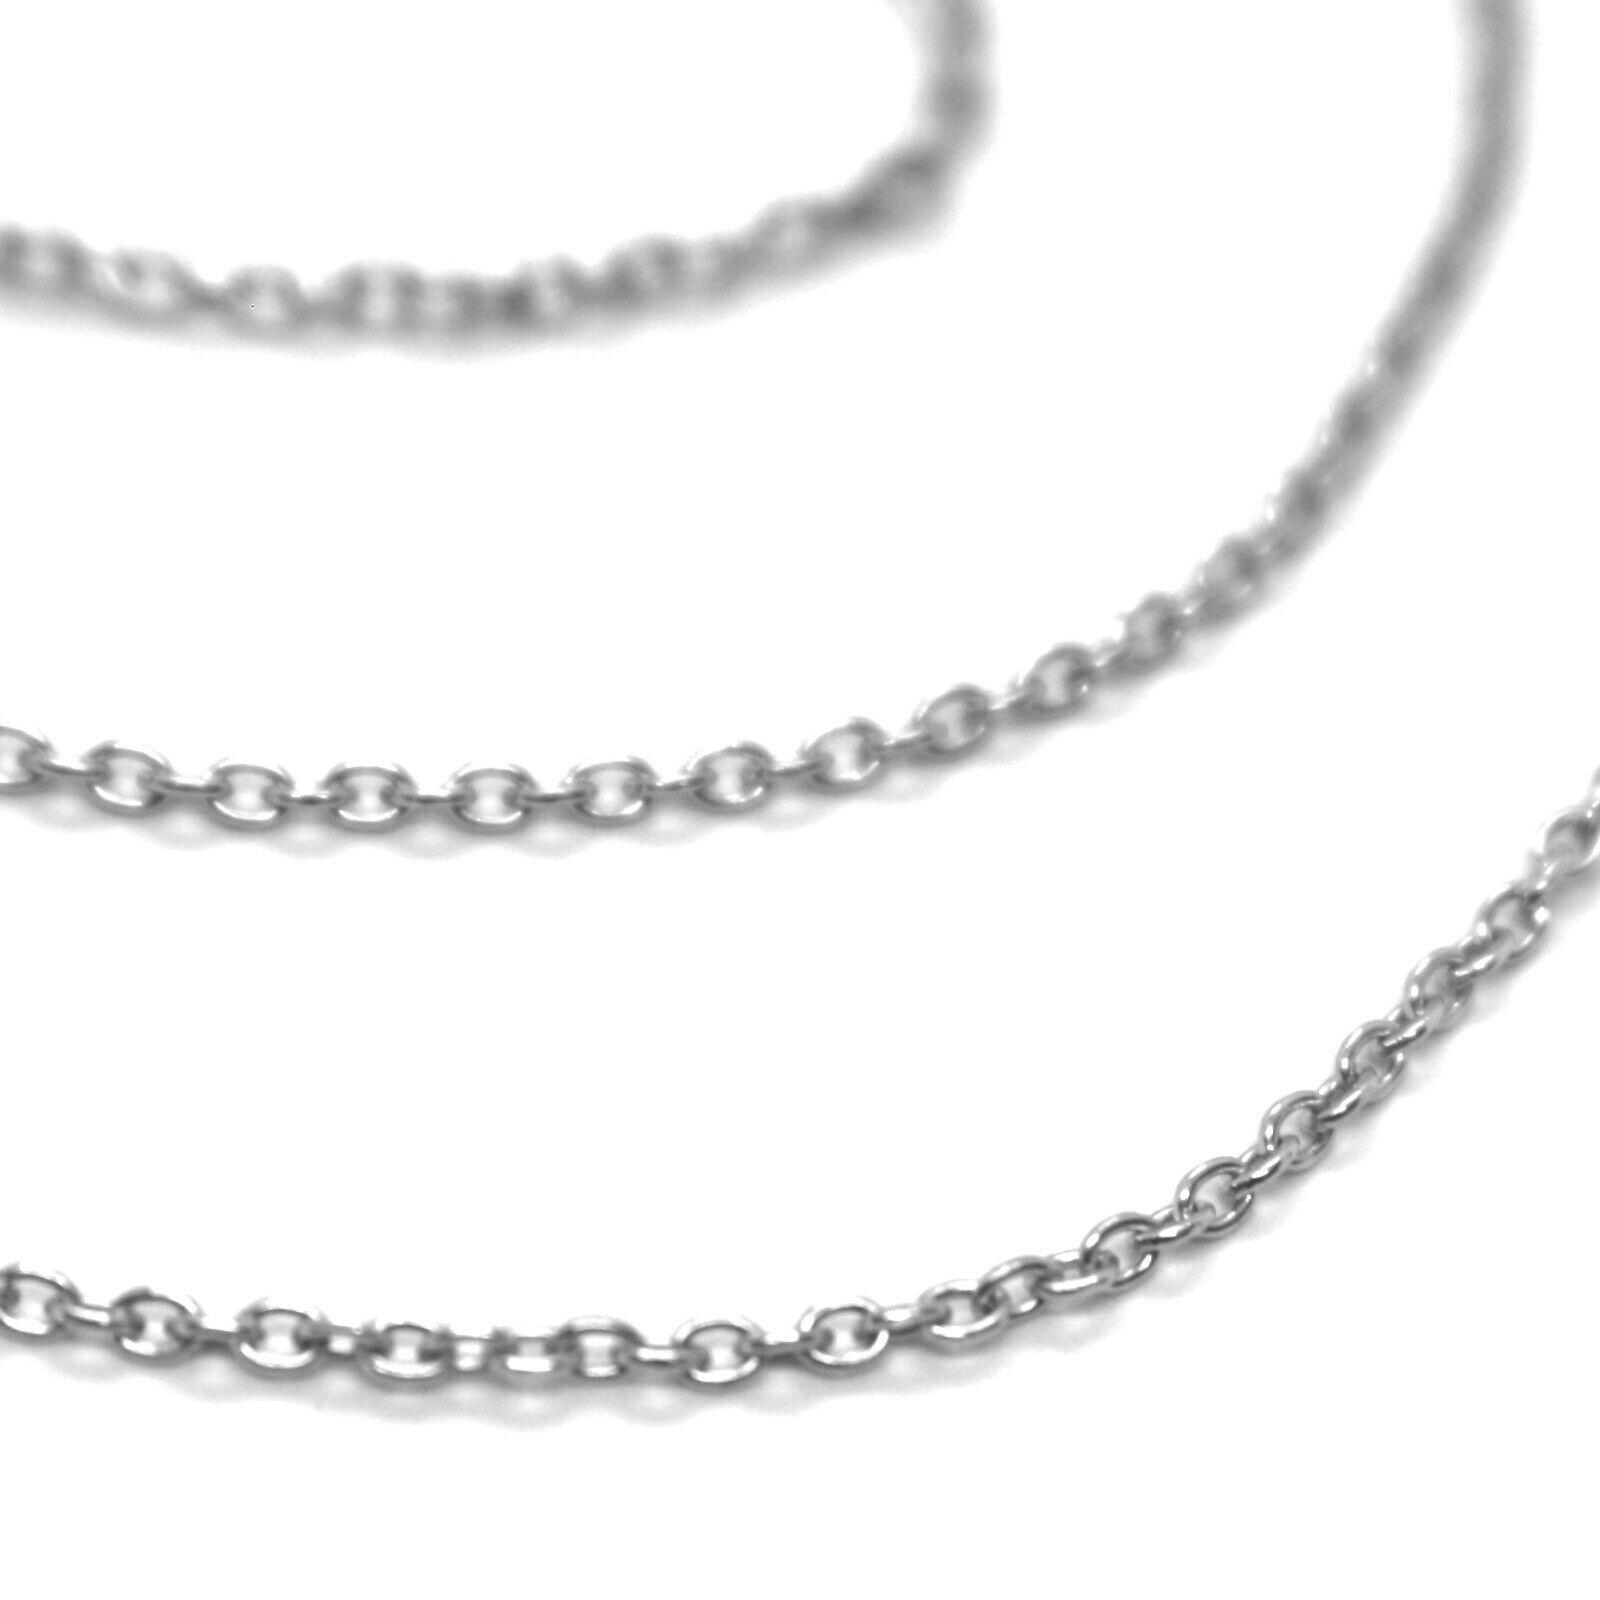 MINI GOLD CHAIN WHITE 750 18K, 40 45 0,5 50 CM, JERSEY ROLO', CIRCLES DIAM. 1 MM image 3